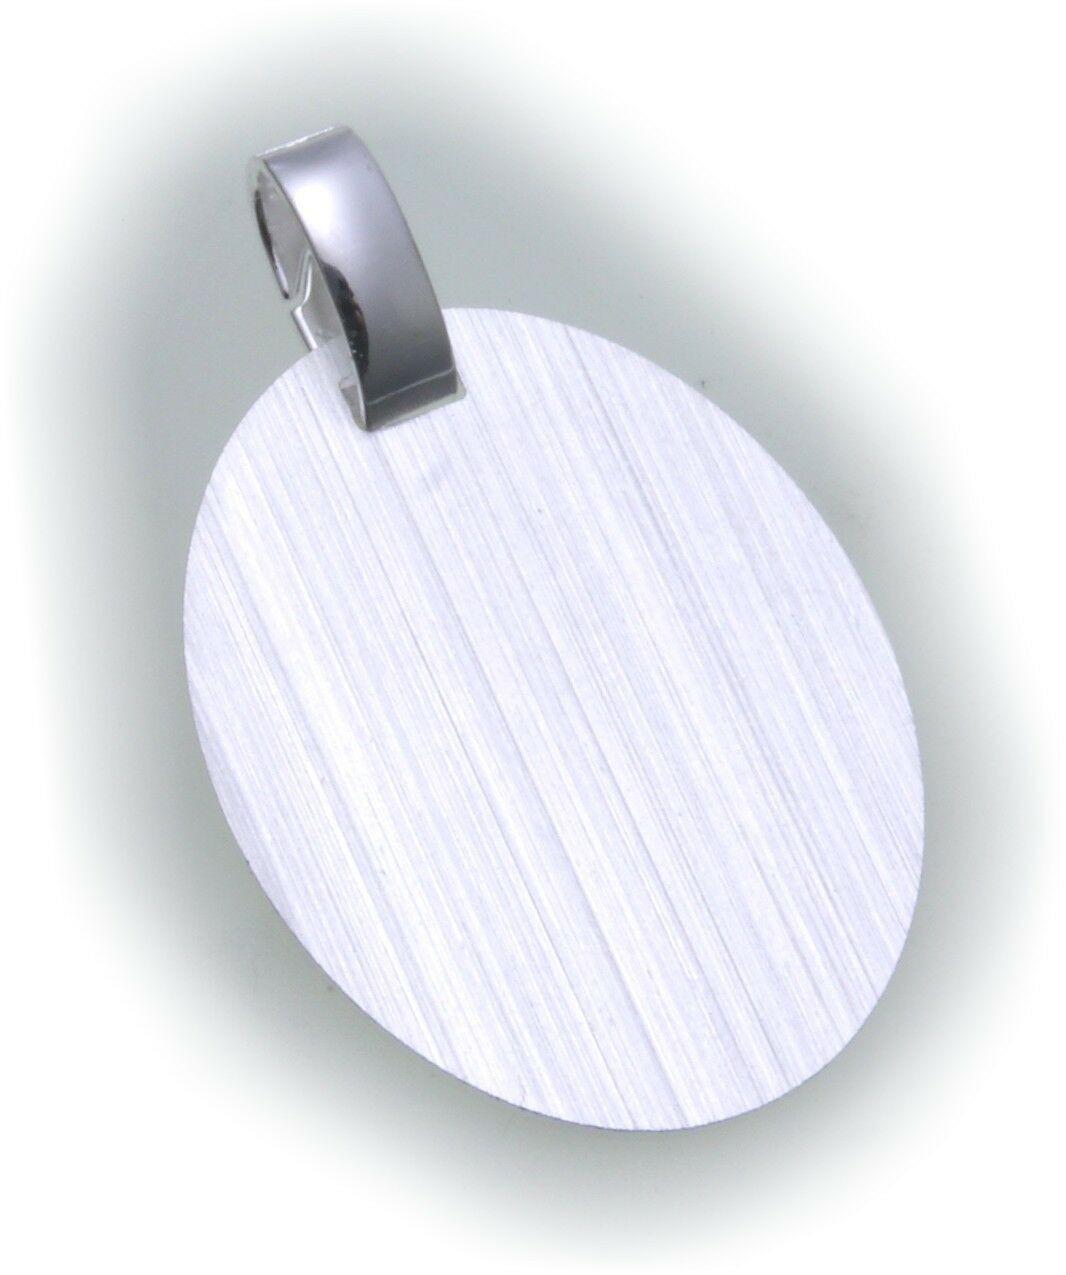 Anhänger Gravurplatte oval echt Silber 925 incl. Gravur Sterlingsilber Unisex